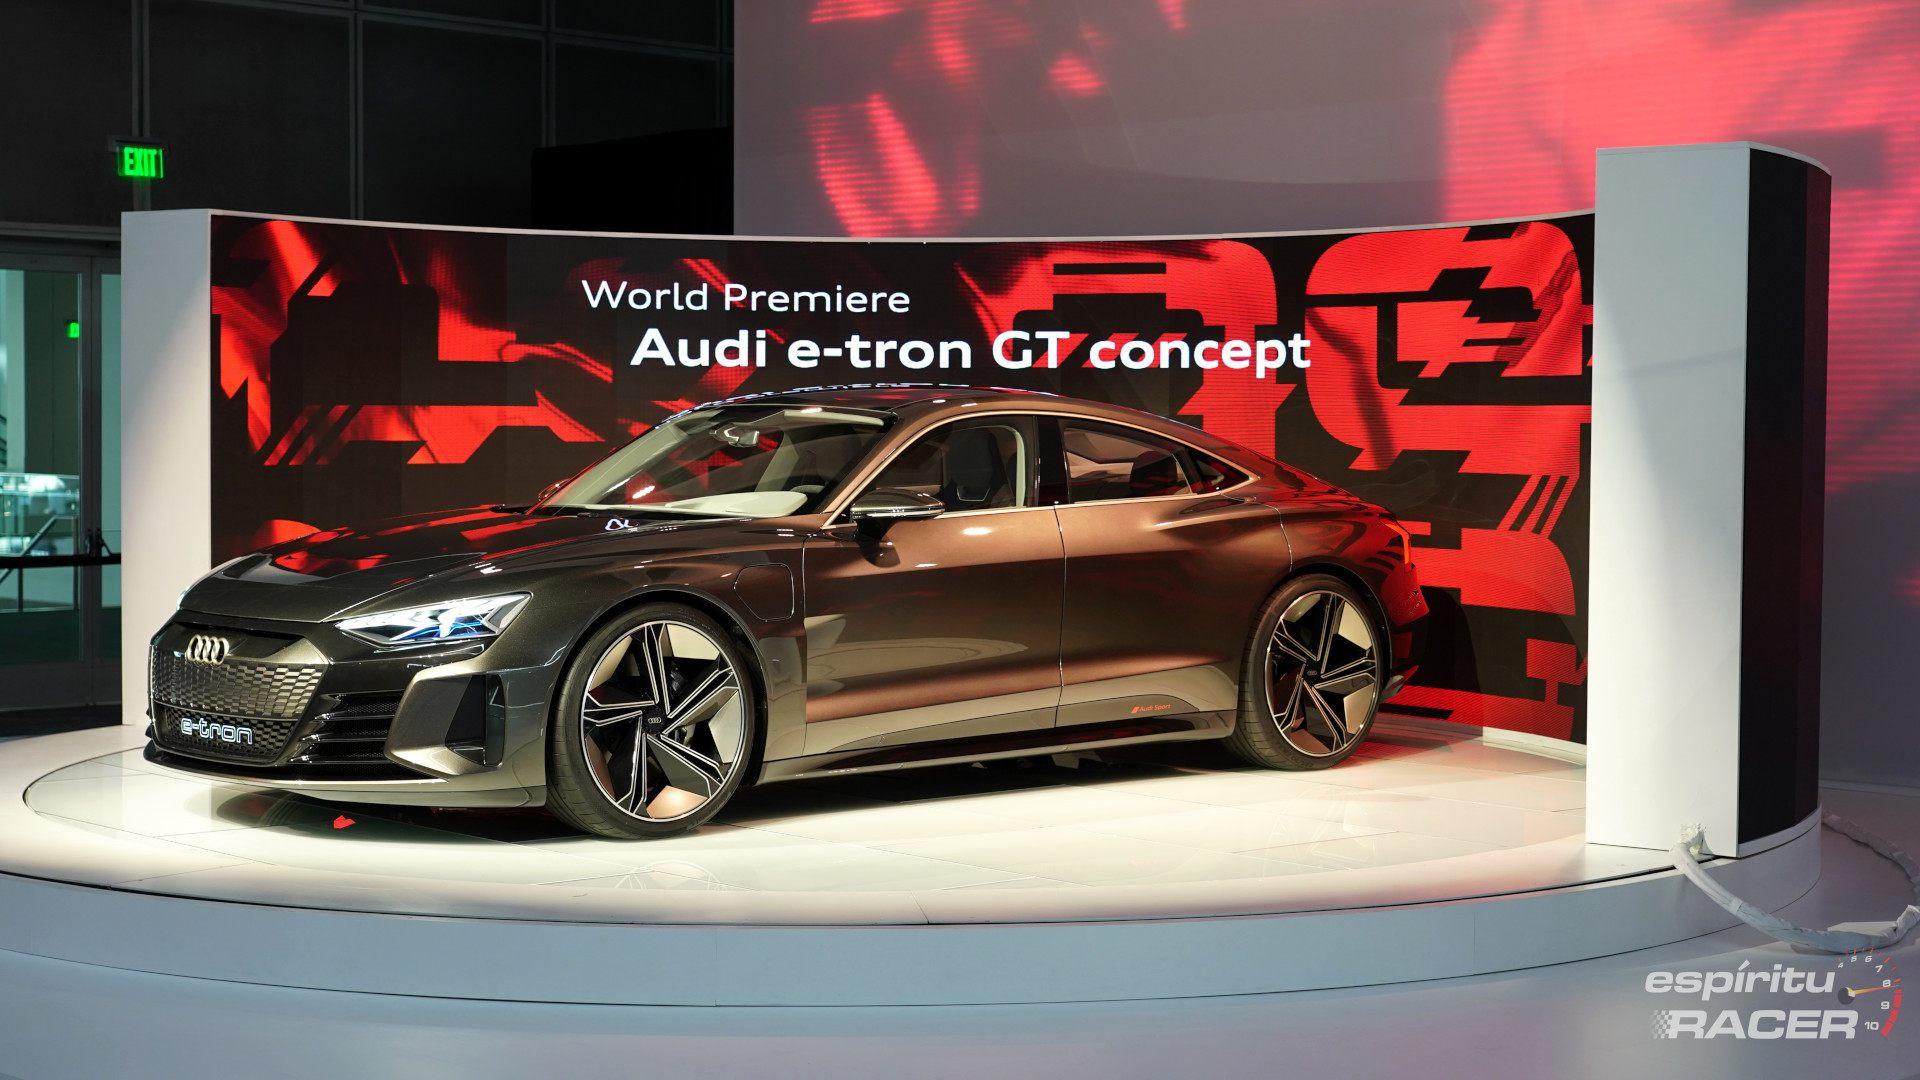 Audi e-tron GT Concept, el primo del Porsche Taycan